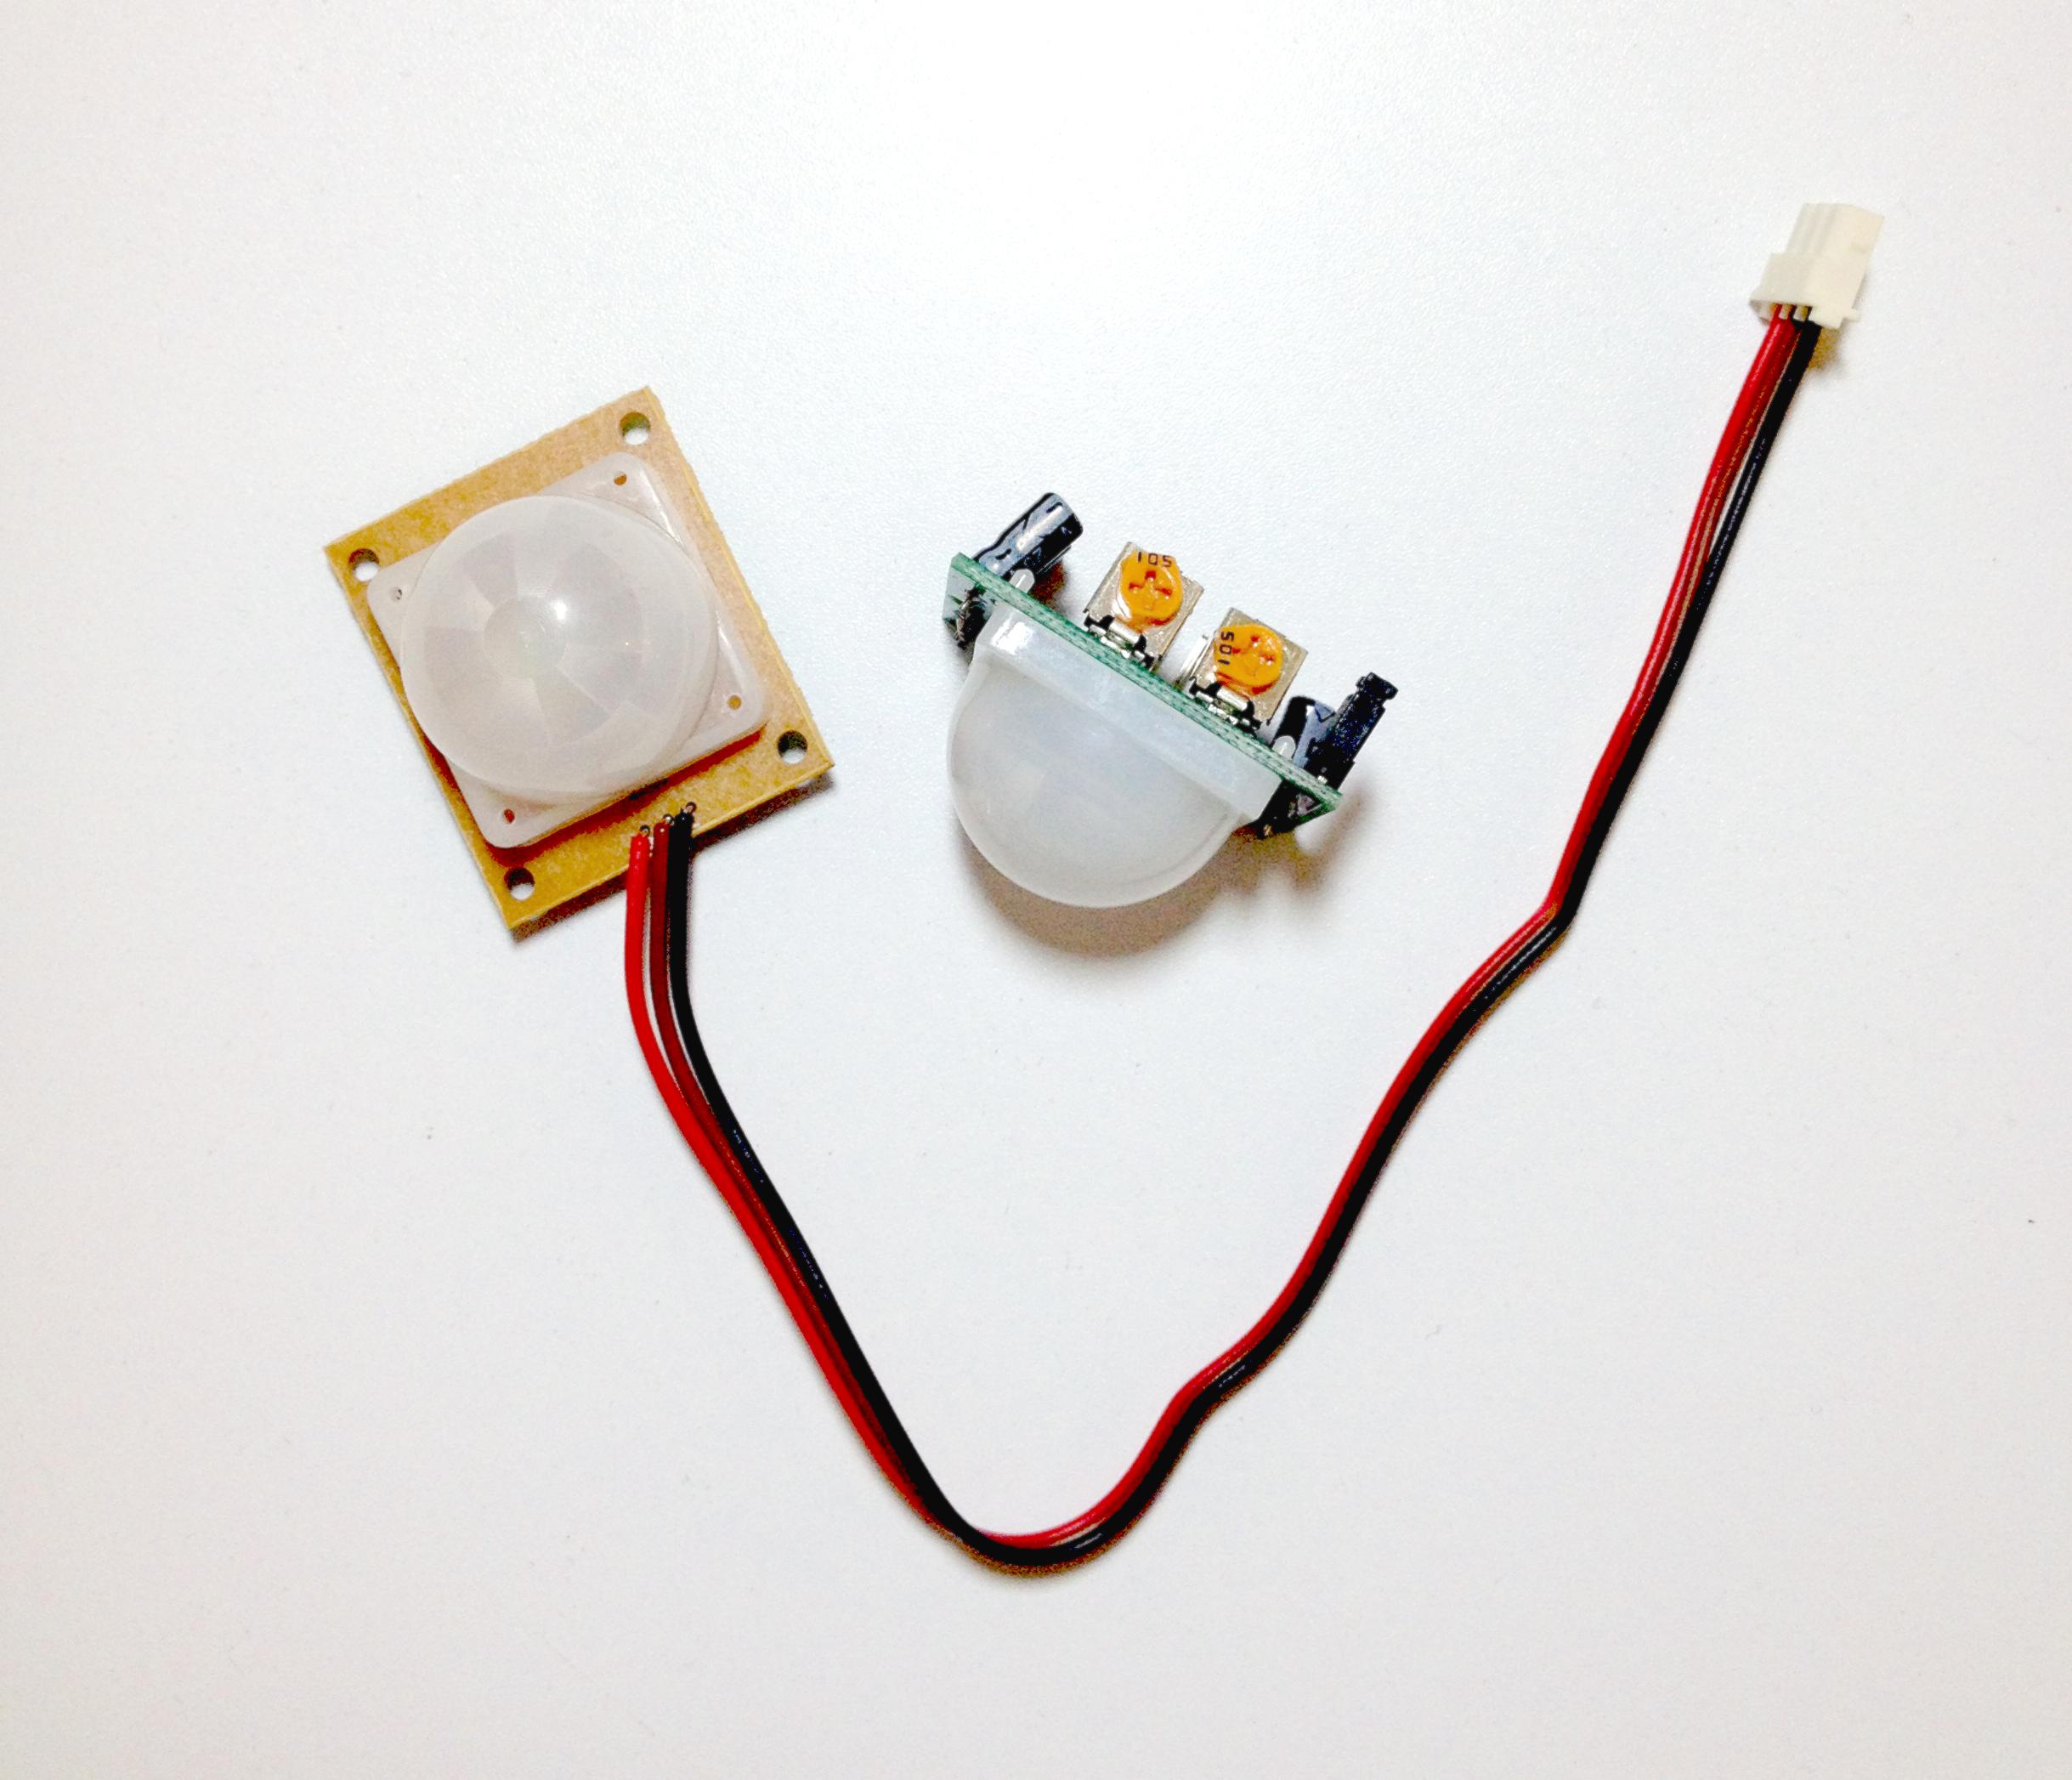 Lecci n 27 arduino sensor de movimiento pir hardware - Sensor de movimiento luz ...